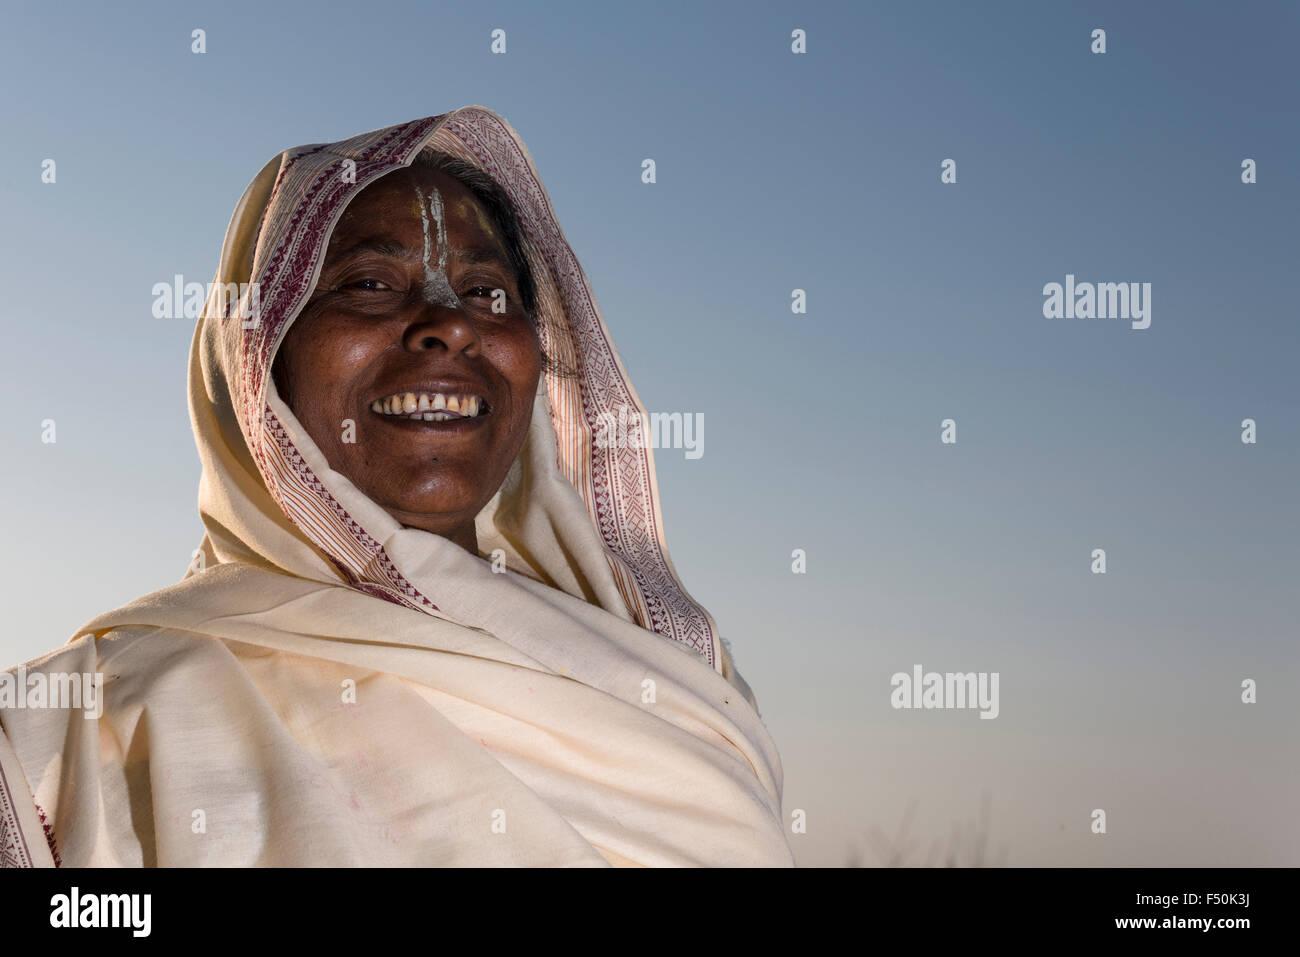 Older Man Portrait India Stock Photos & Older Man Portrait India Stock Images - Alamy